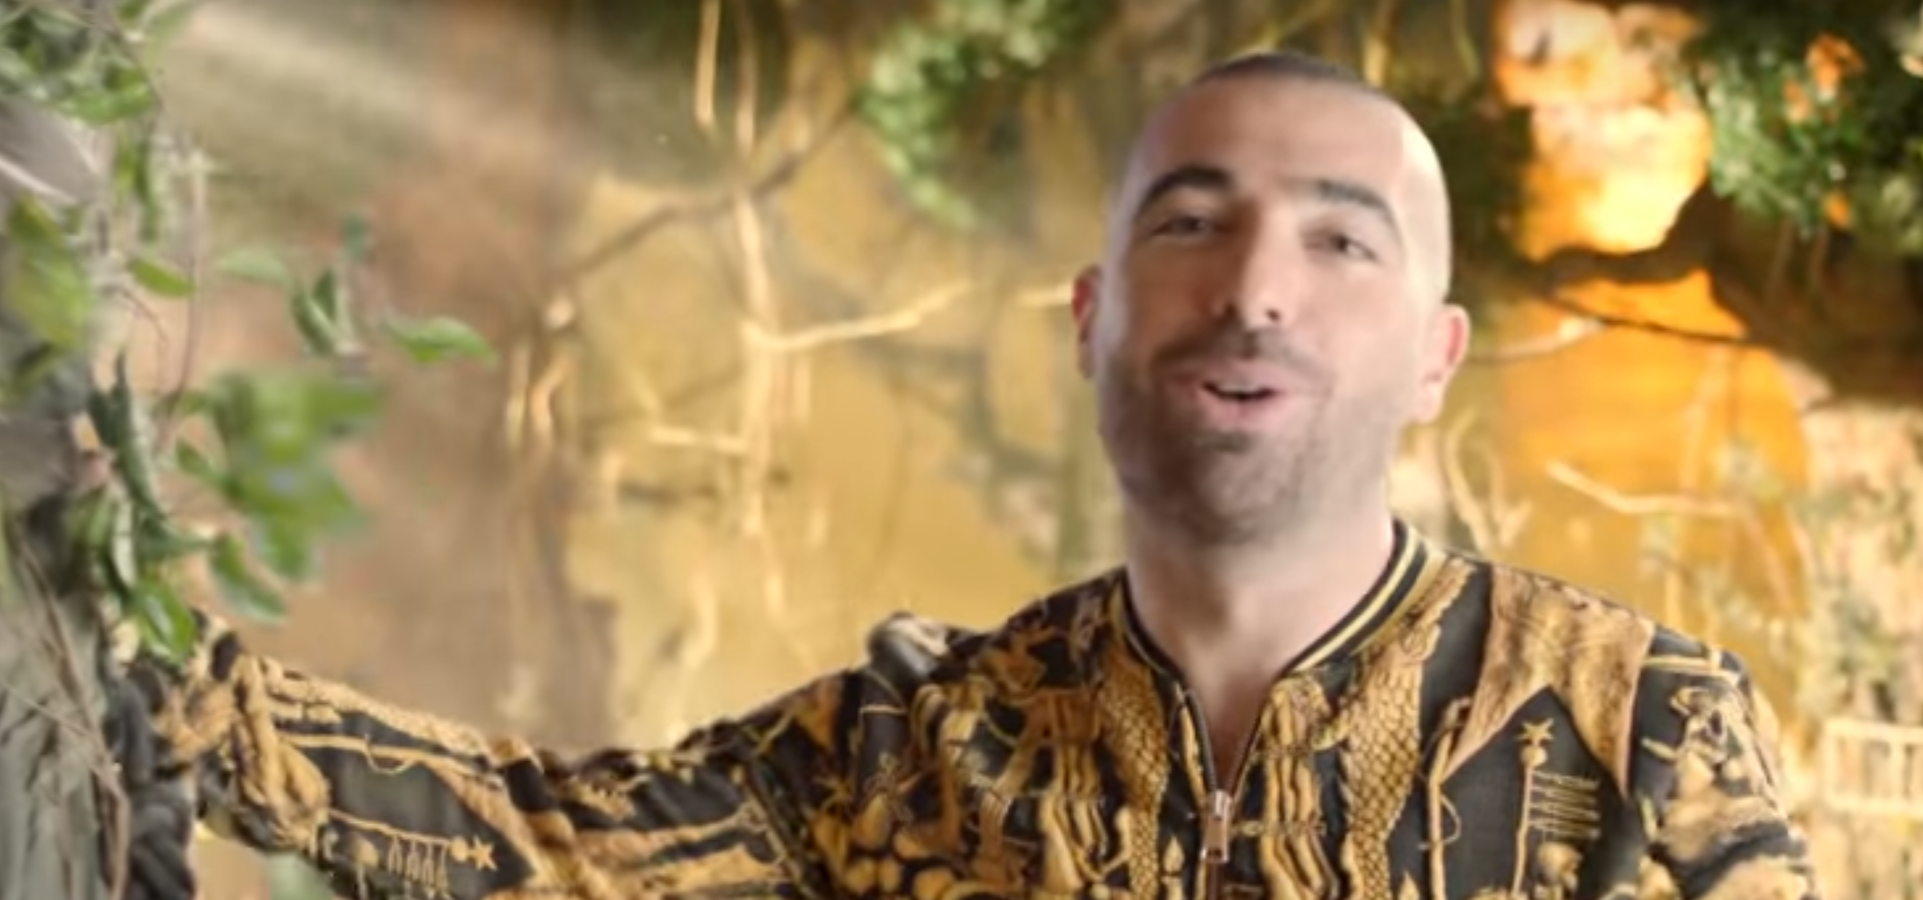 Israel's Top Pop Star Won't Break Shabbos & Other Orthodox Jews in the News